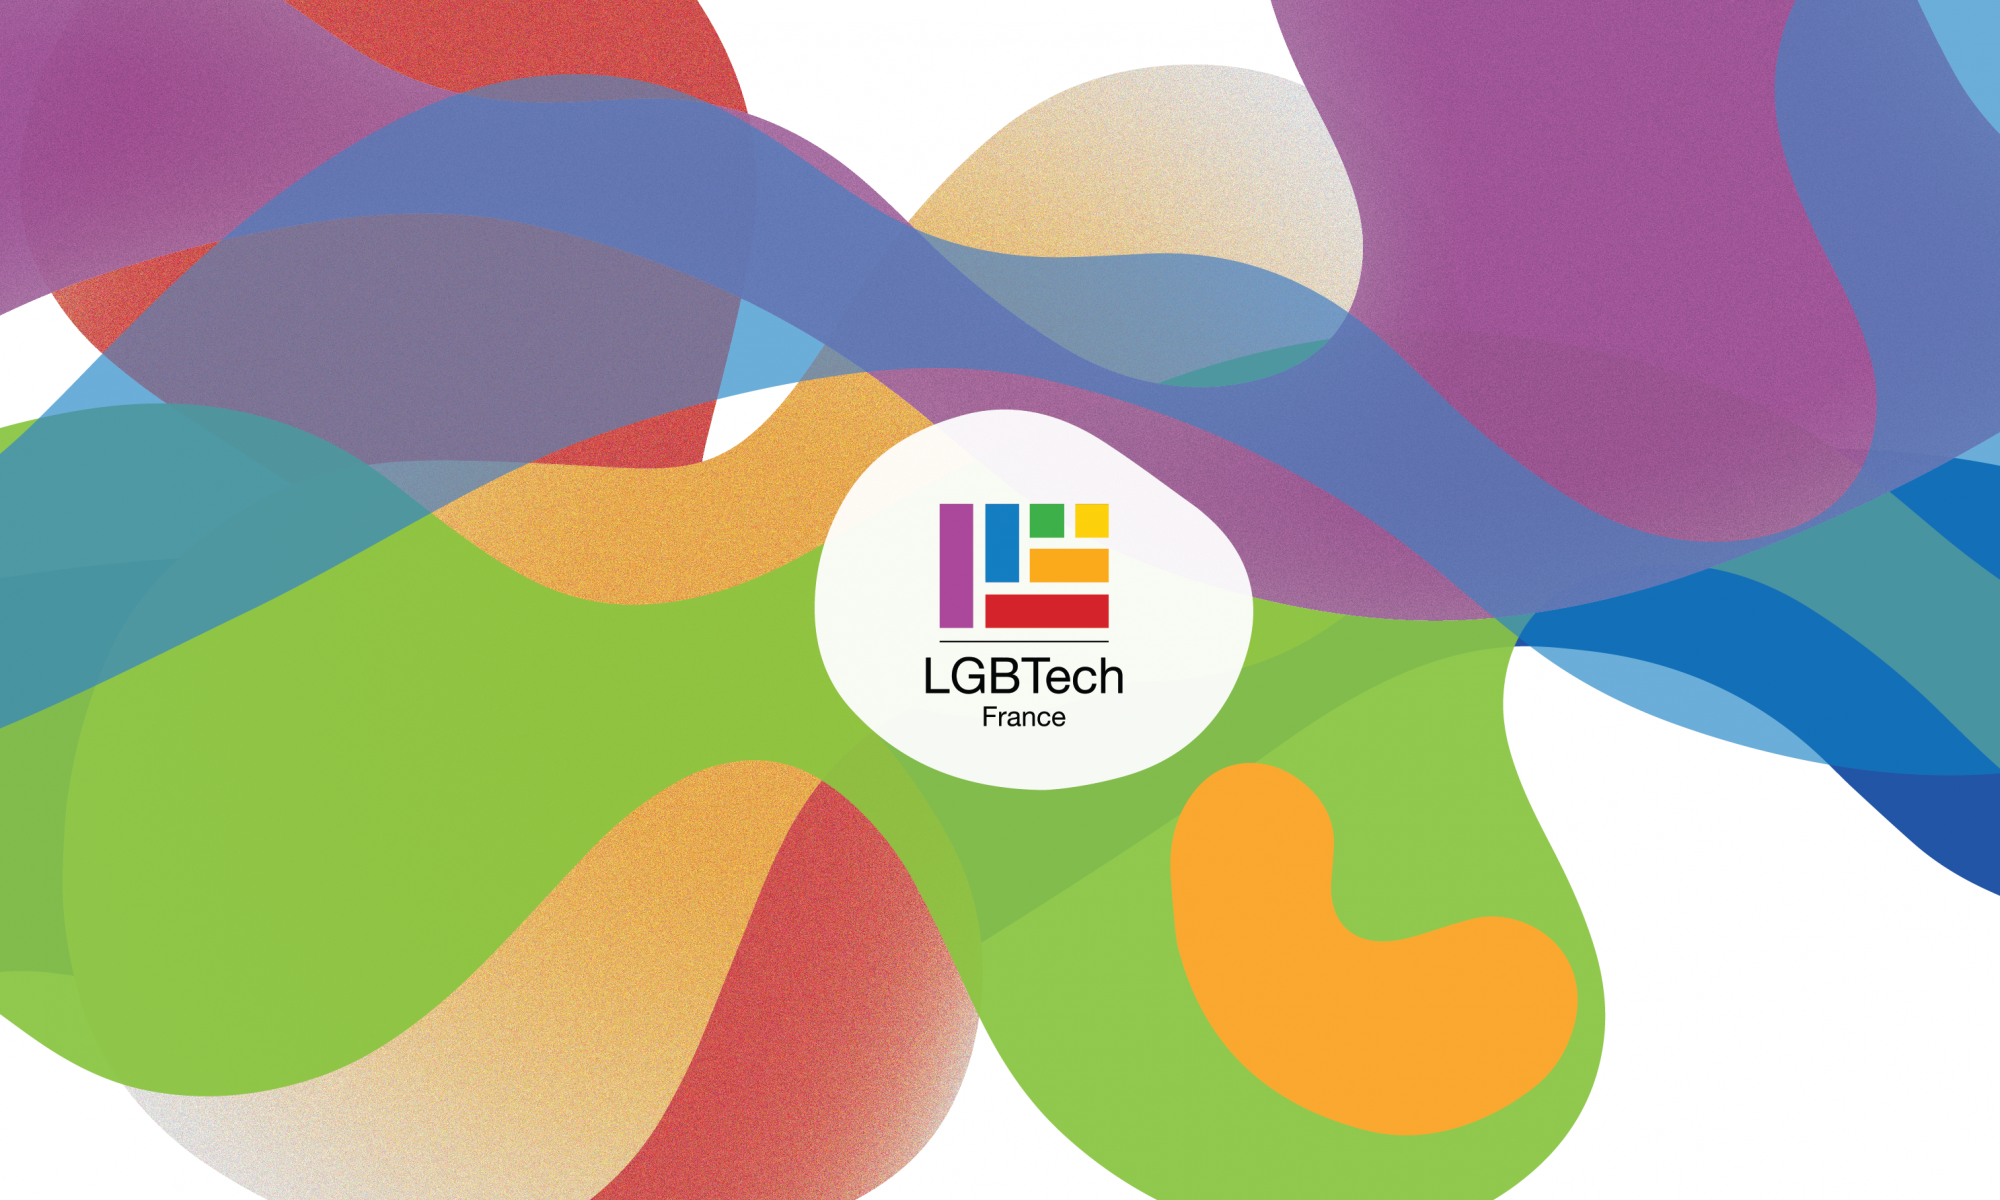 LGBTech France